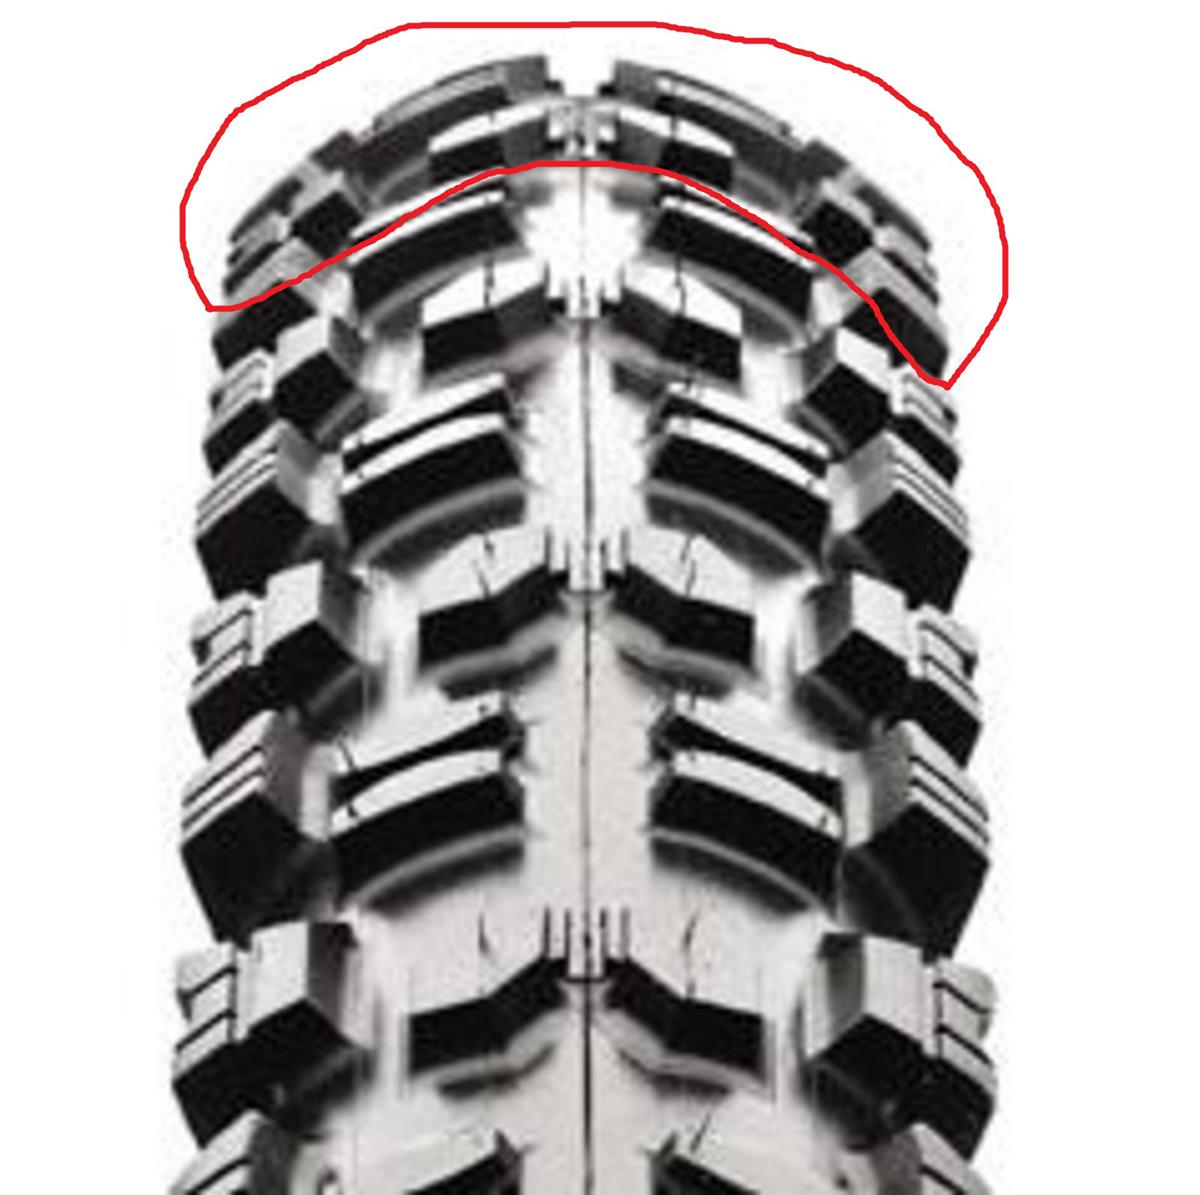 DHR Profile, Blister Gear Review